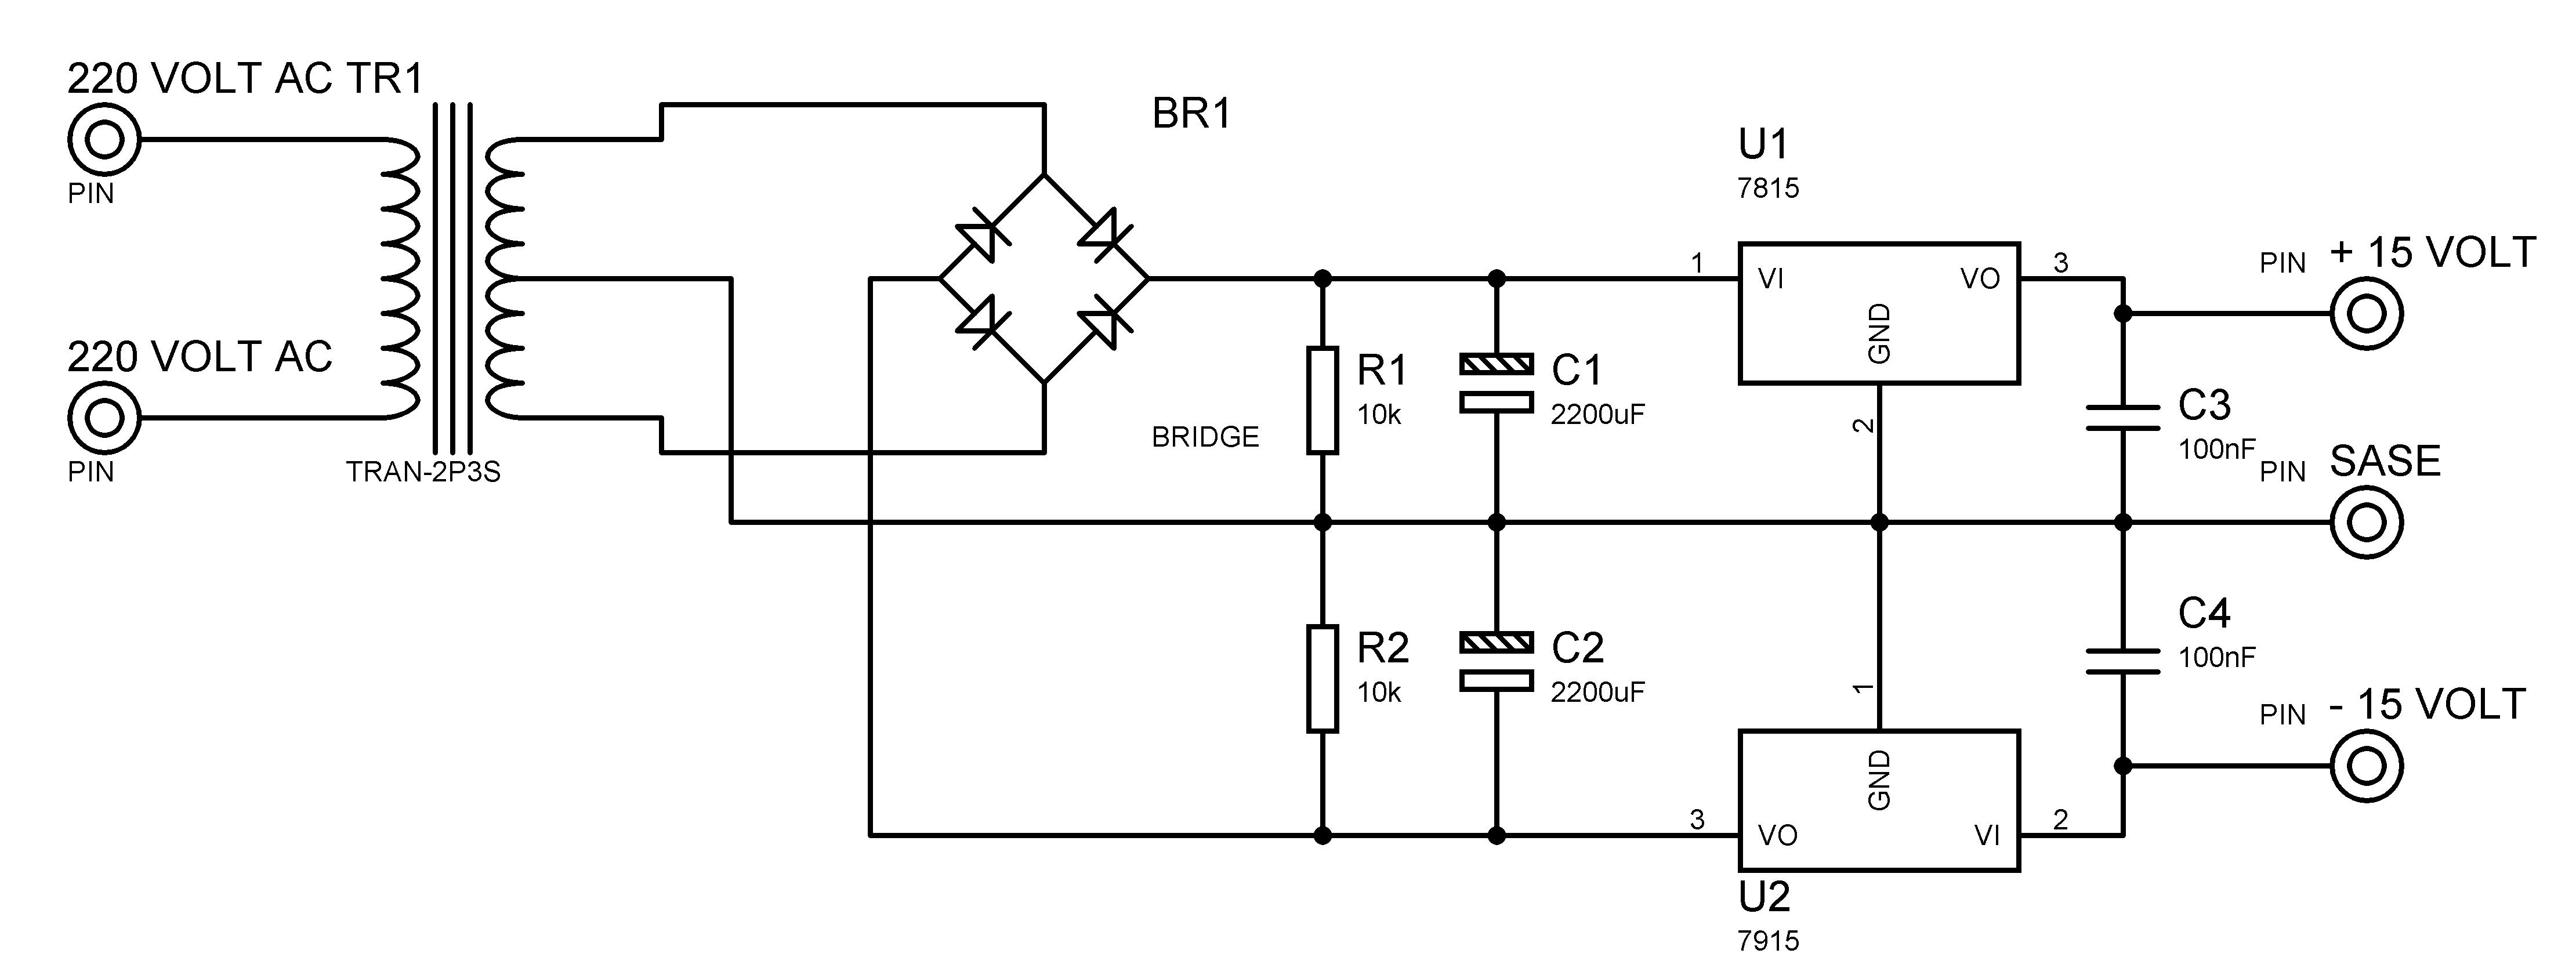 15 Volt Simetrik G Kayna Googleda Ara Electroncs Lm317 Overvoltage Protection